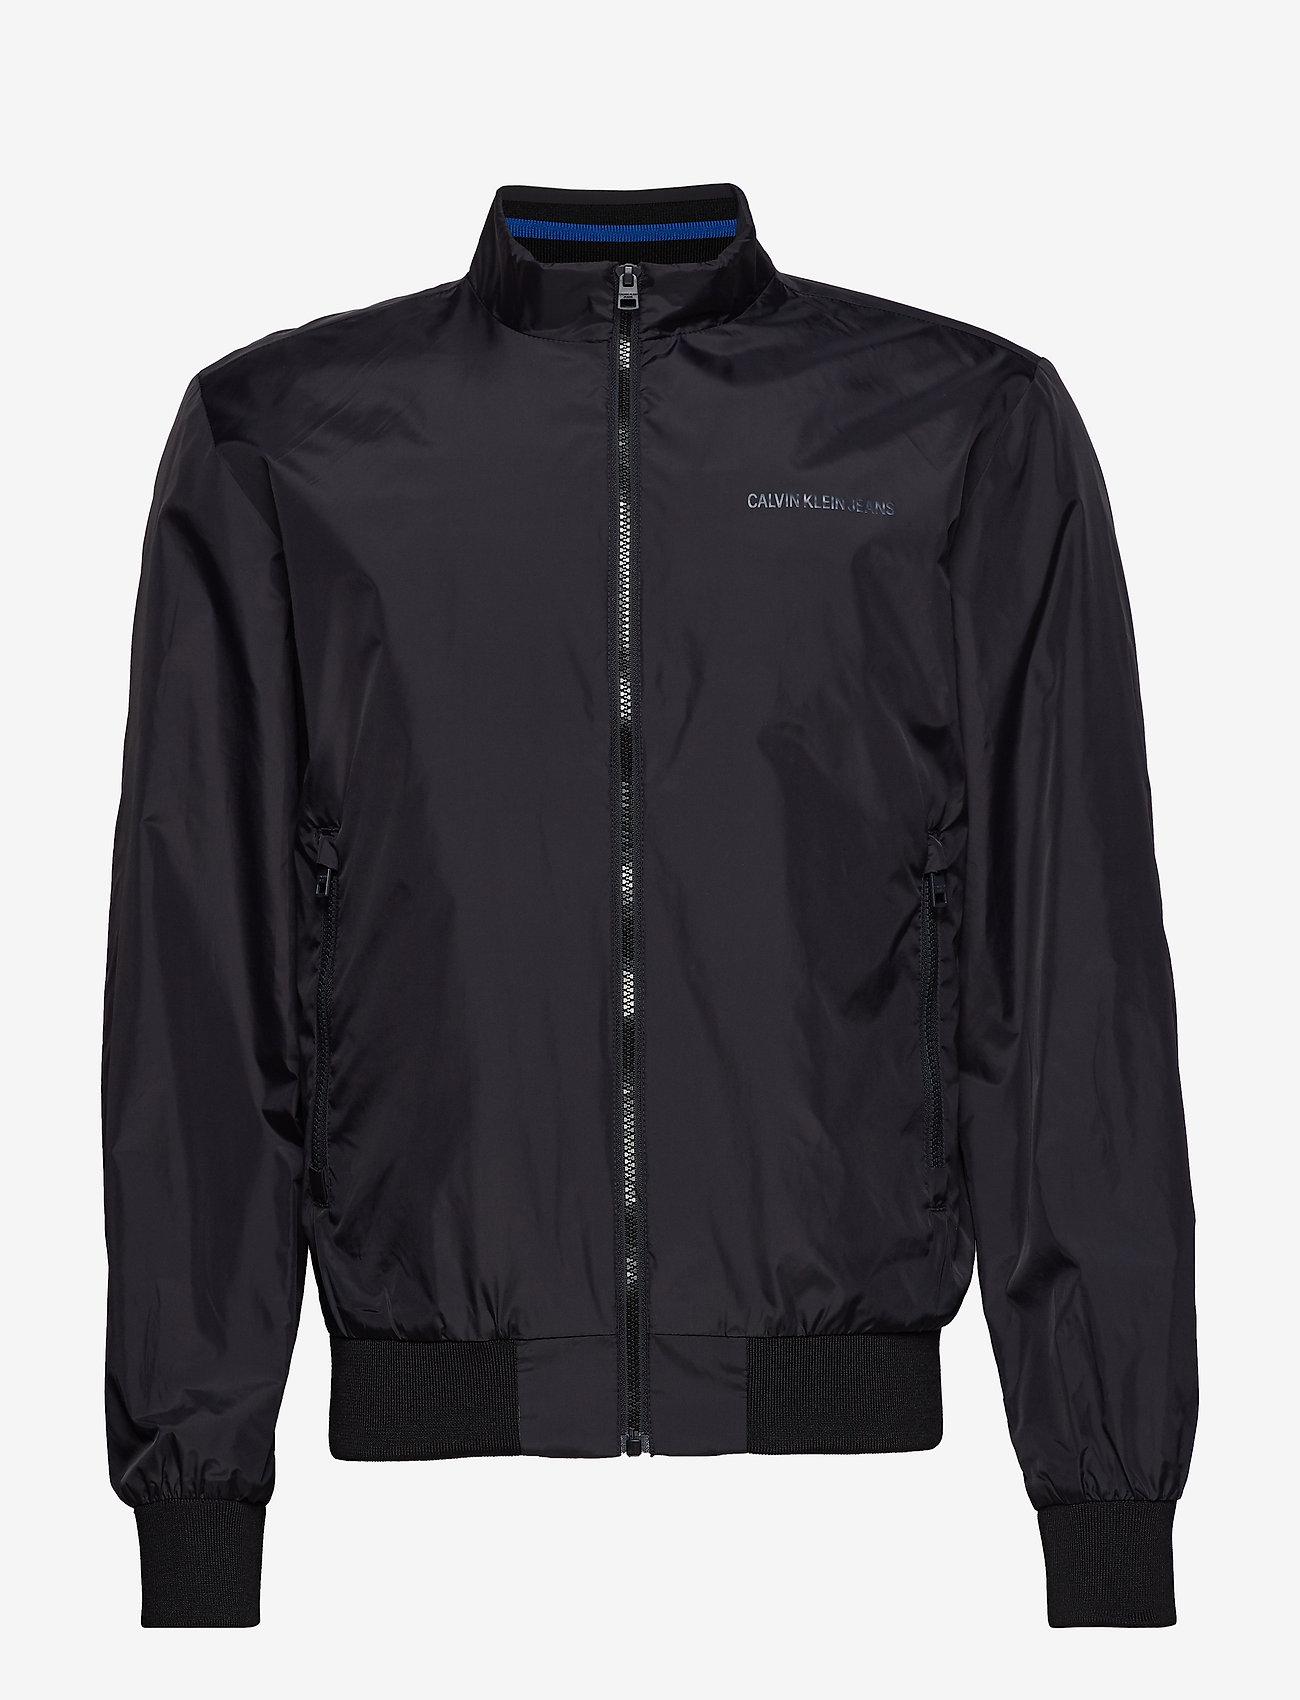 Core Nylon Jacket (Ck Black) - Calvin Klein Jeans Bz7ipt